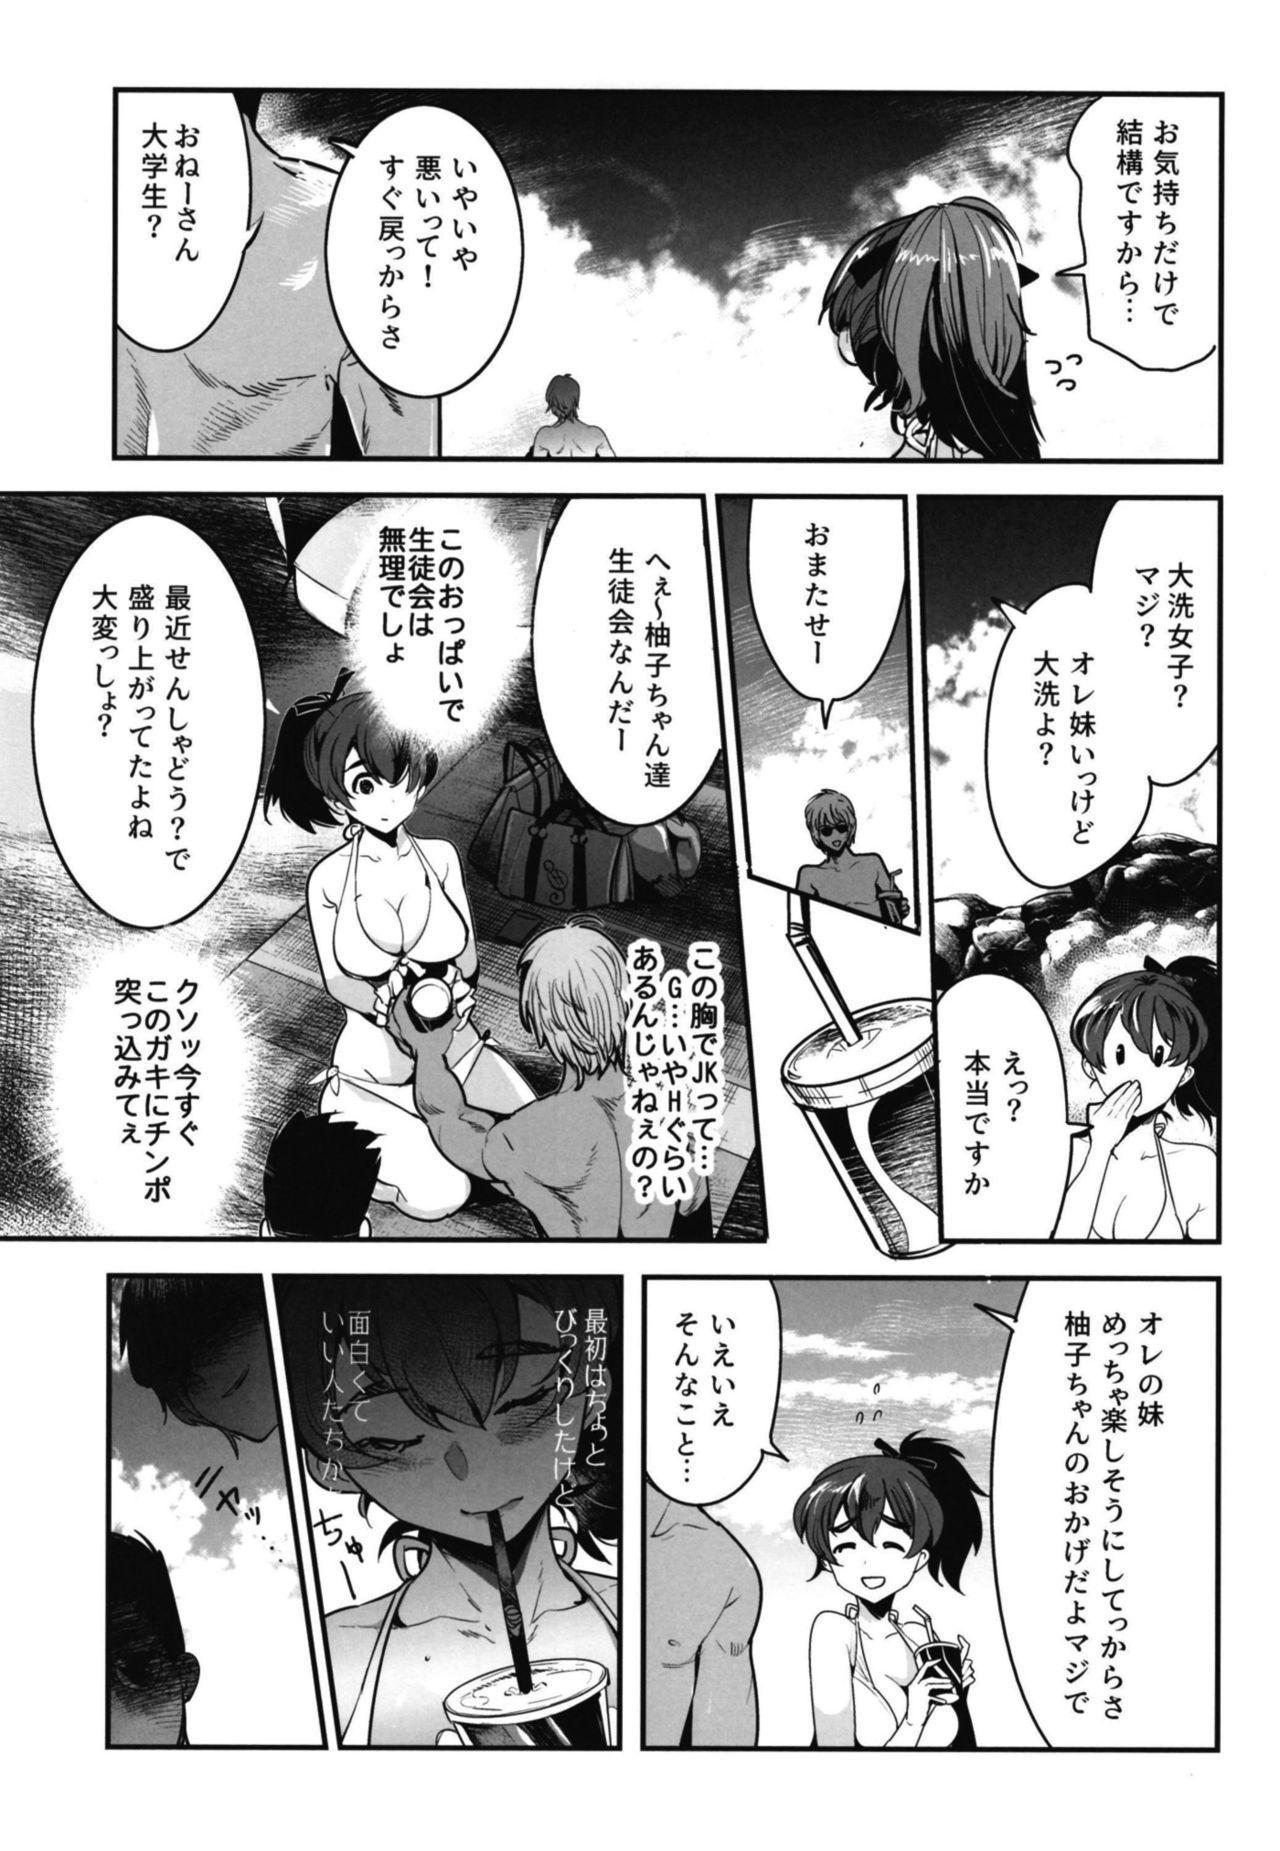 GirlPan Rakugakichou 8 4